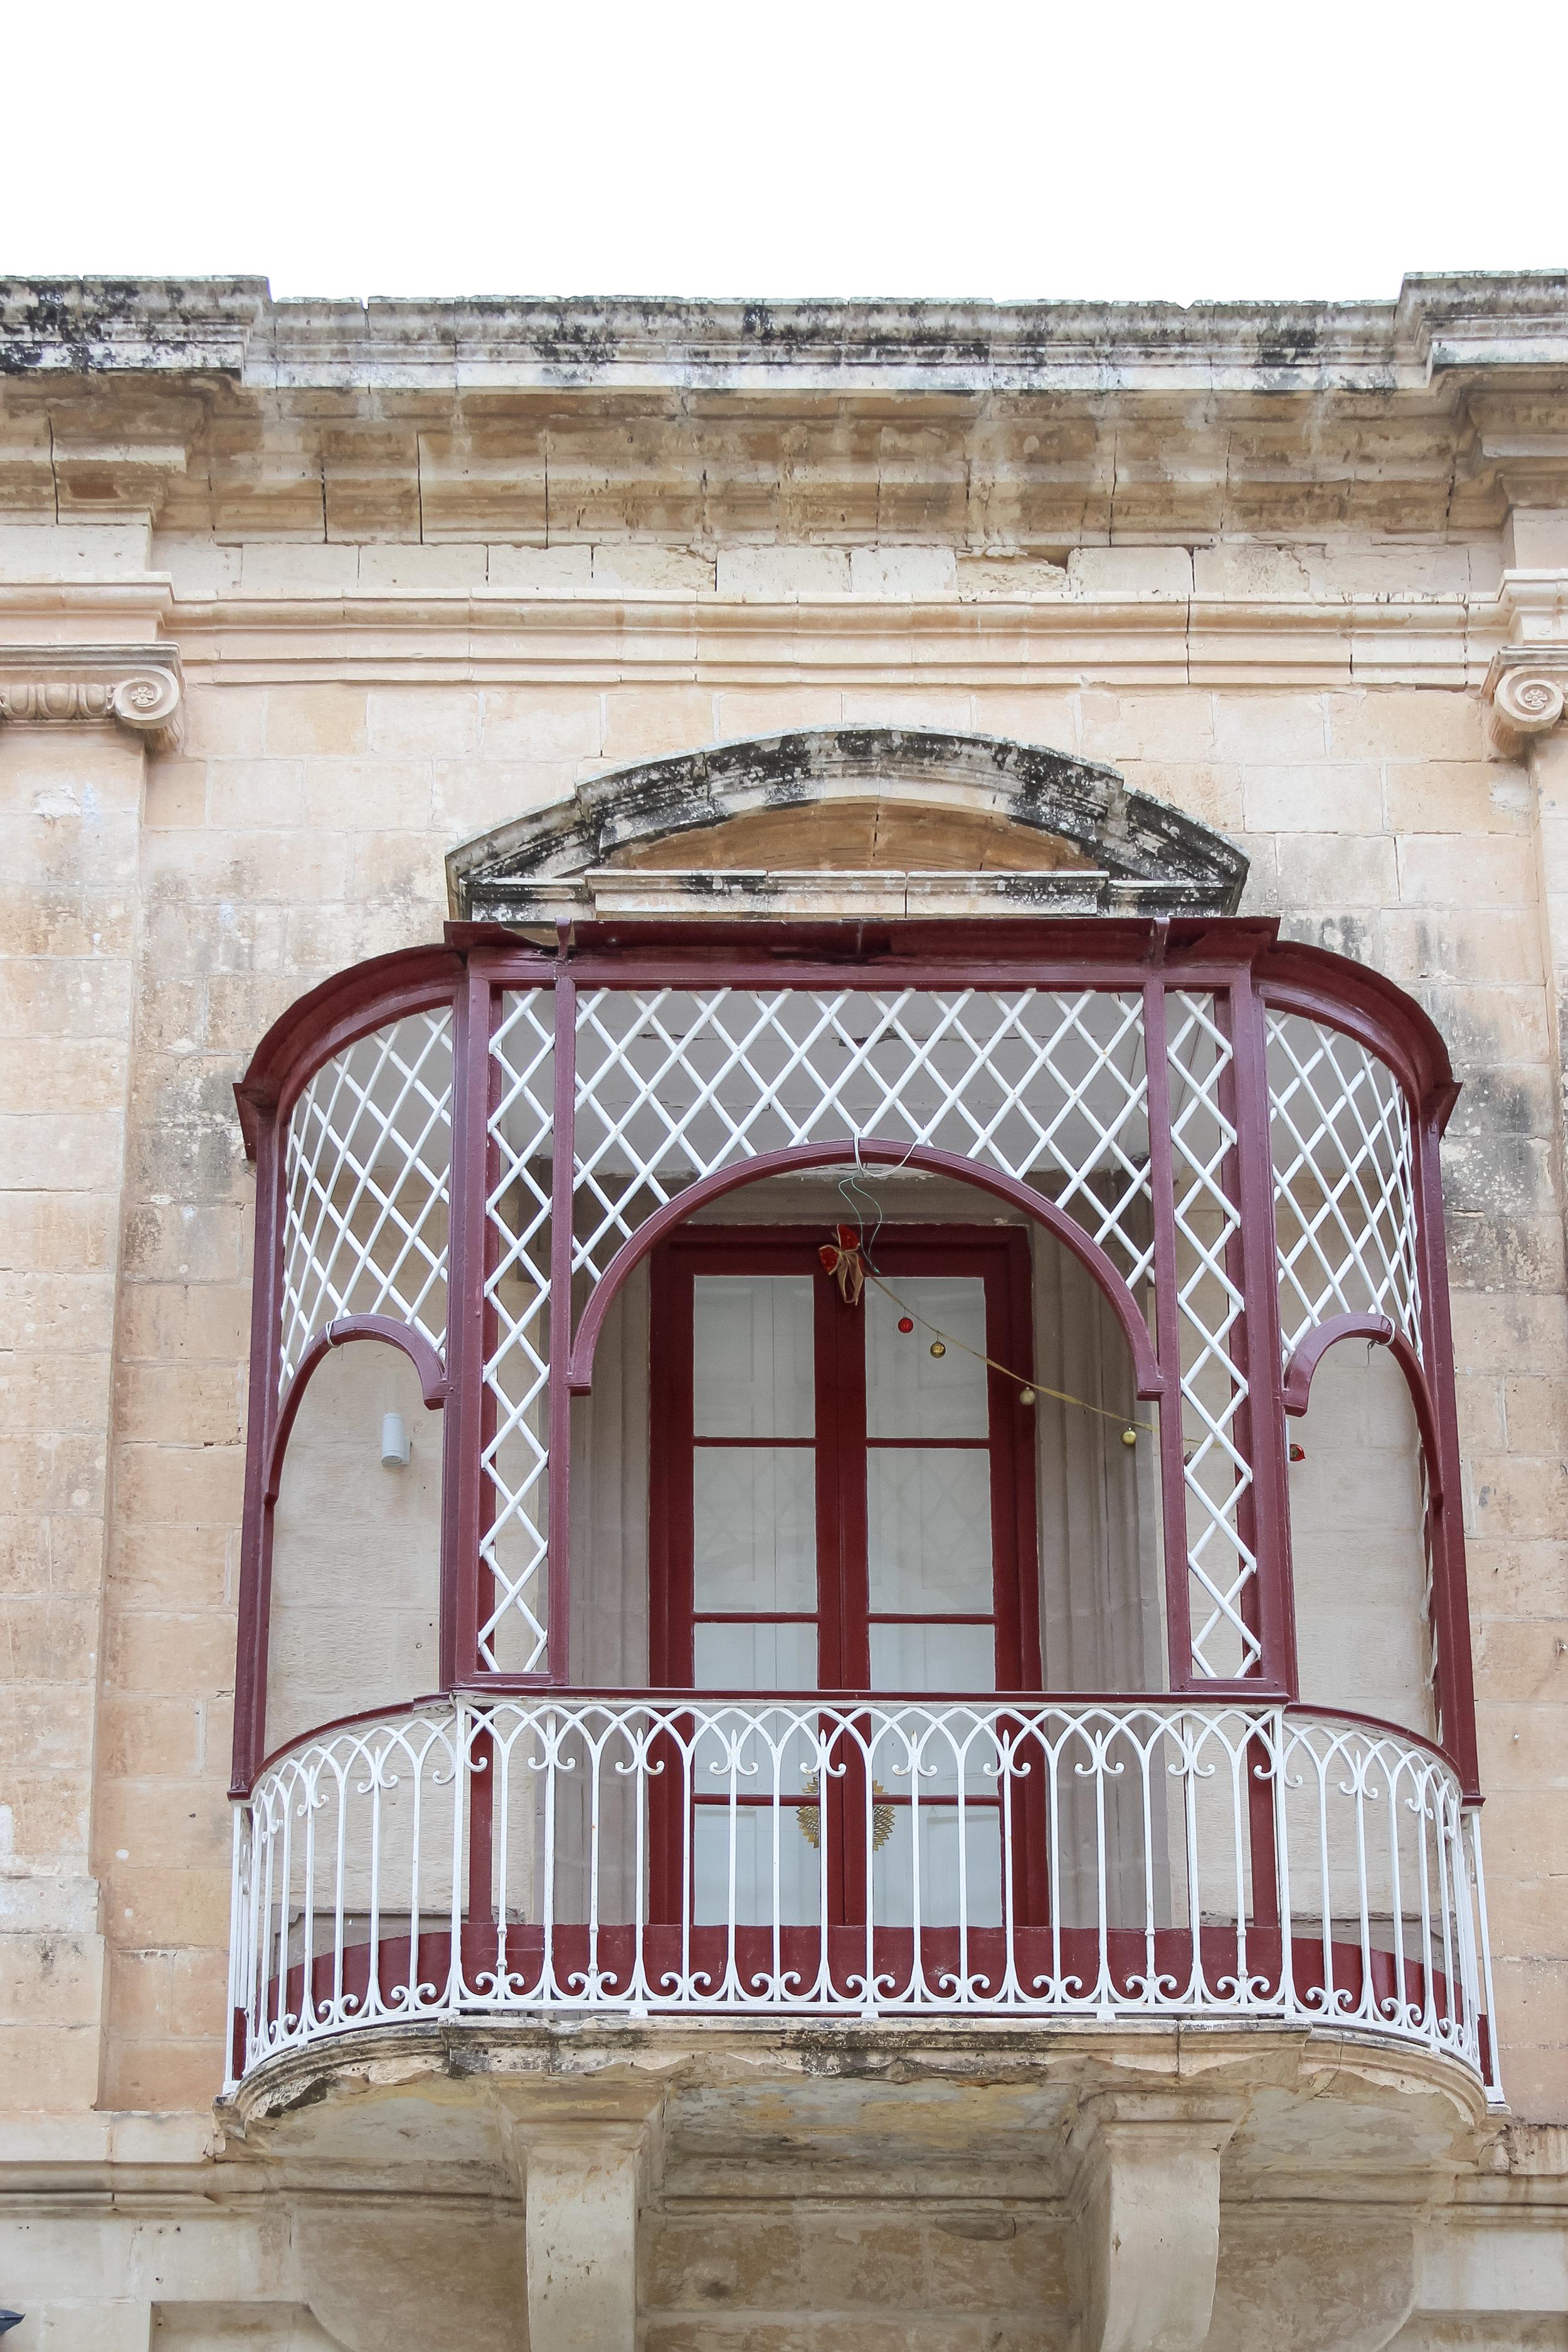 Maltese Balcony   Street of Malta   Mdina   - Thinking About Appreciation For Quality In Malta   Malta, Europe   DoLessGetMoreDone.com   - Canon Minimal Travel Documentary Photography - search for Liveability   Sustainability